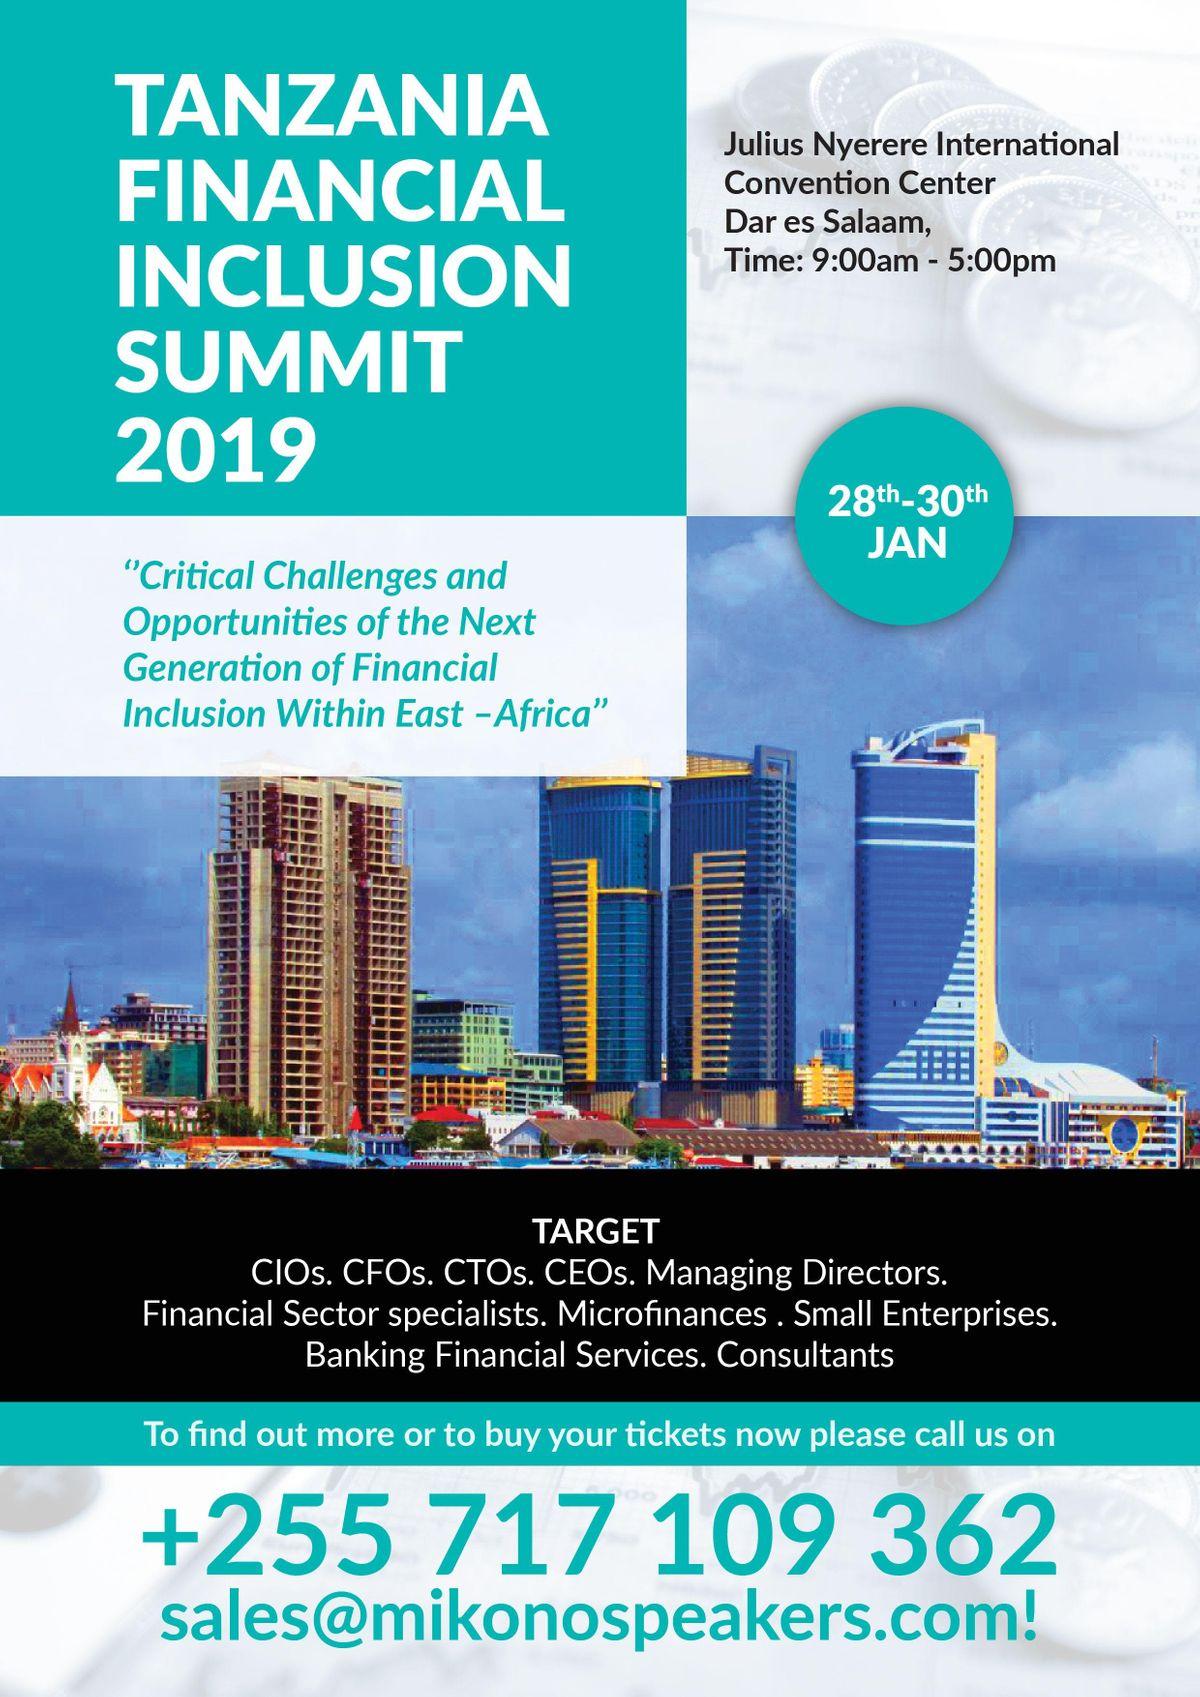 Tanzania Financial Inclusion Summit 2019